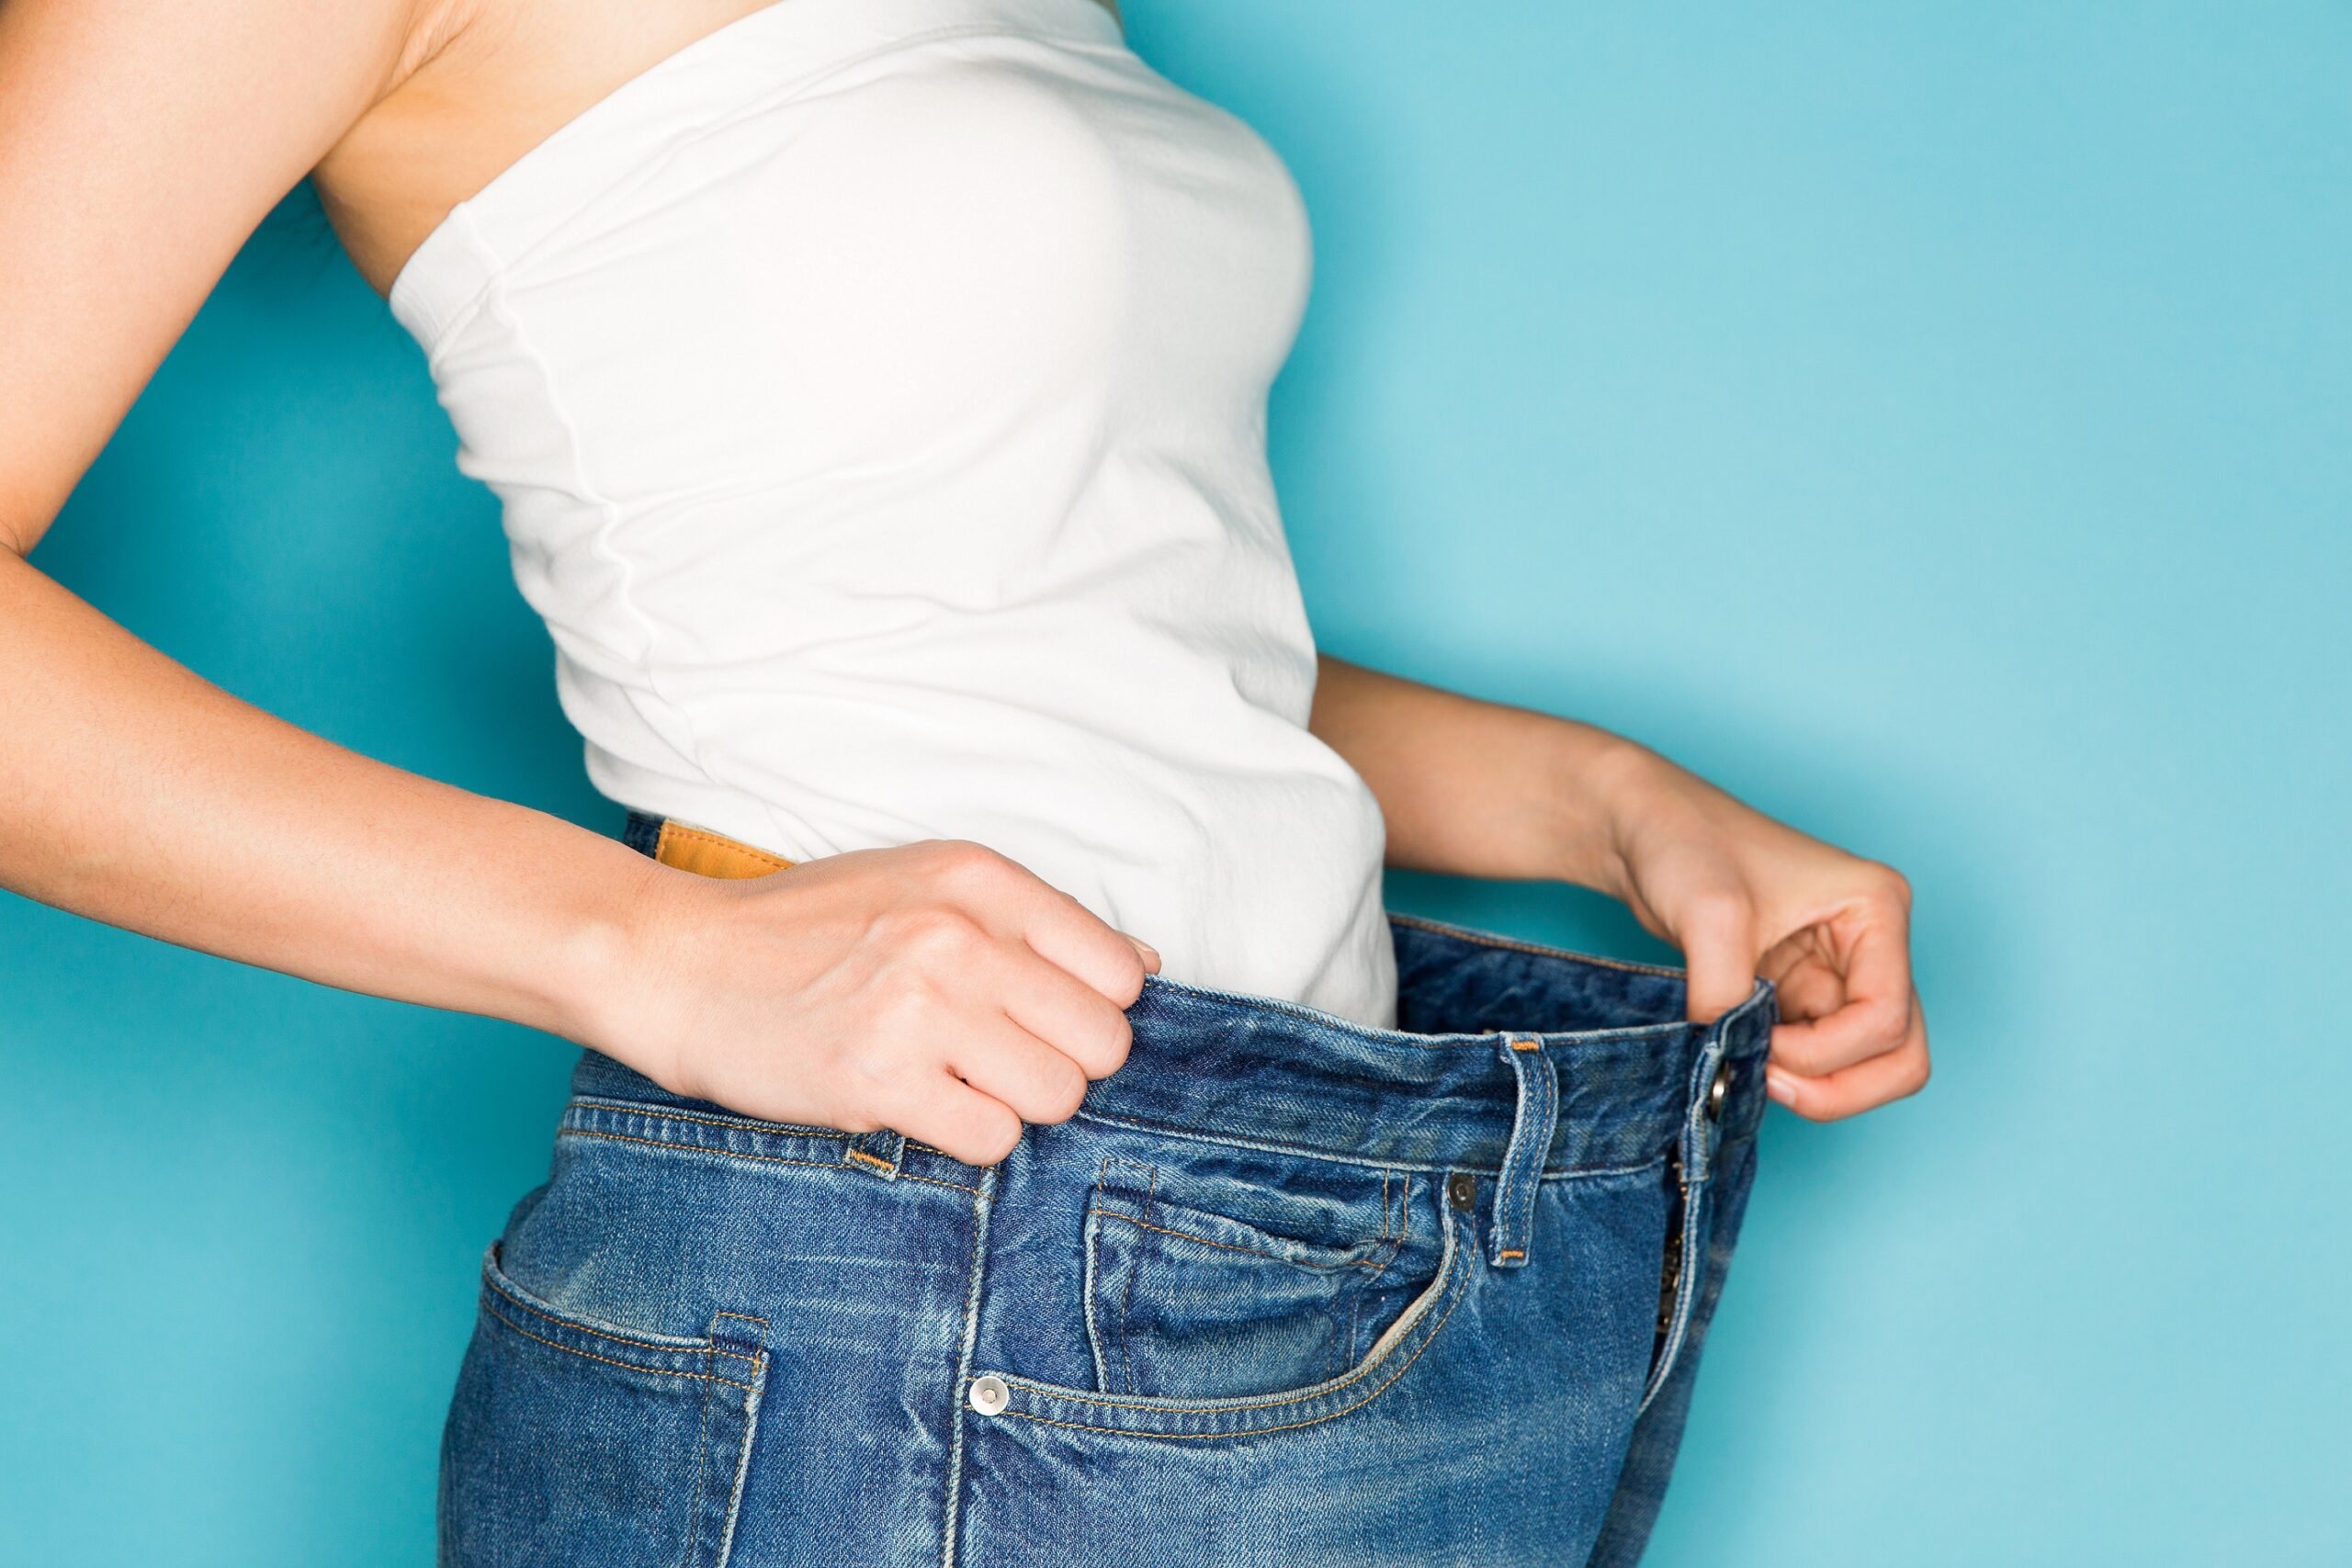 Adipositas: Medikament ermöglicht bis zu 20 Prozent Fettmasse abzunehmen - Heilpraxisnet.de